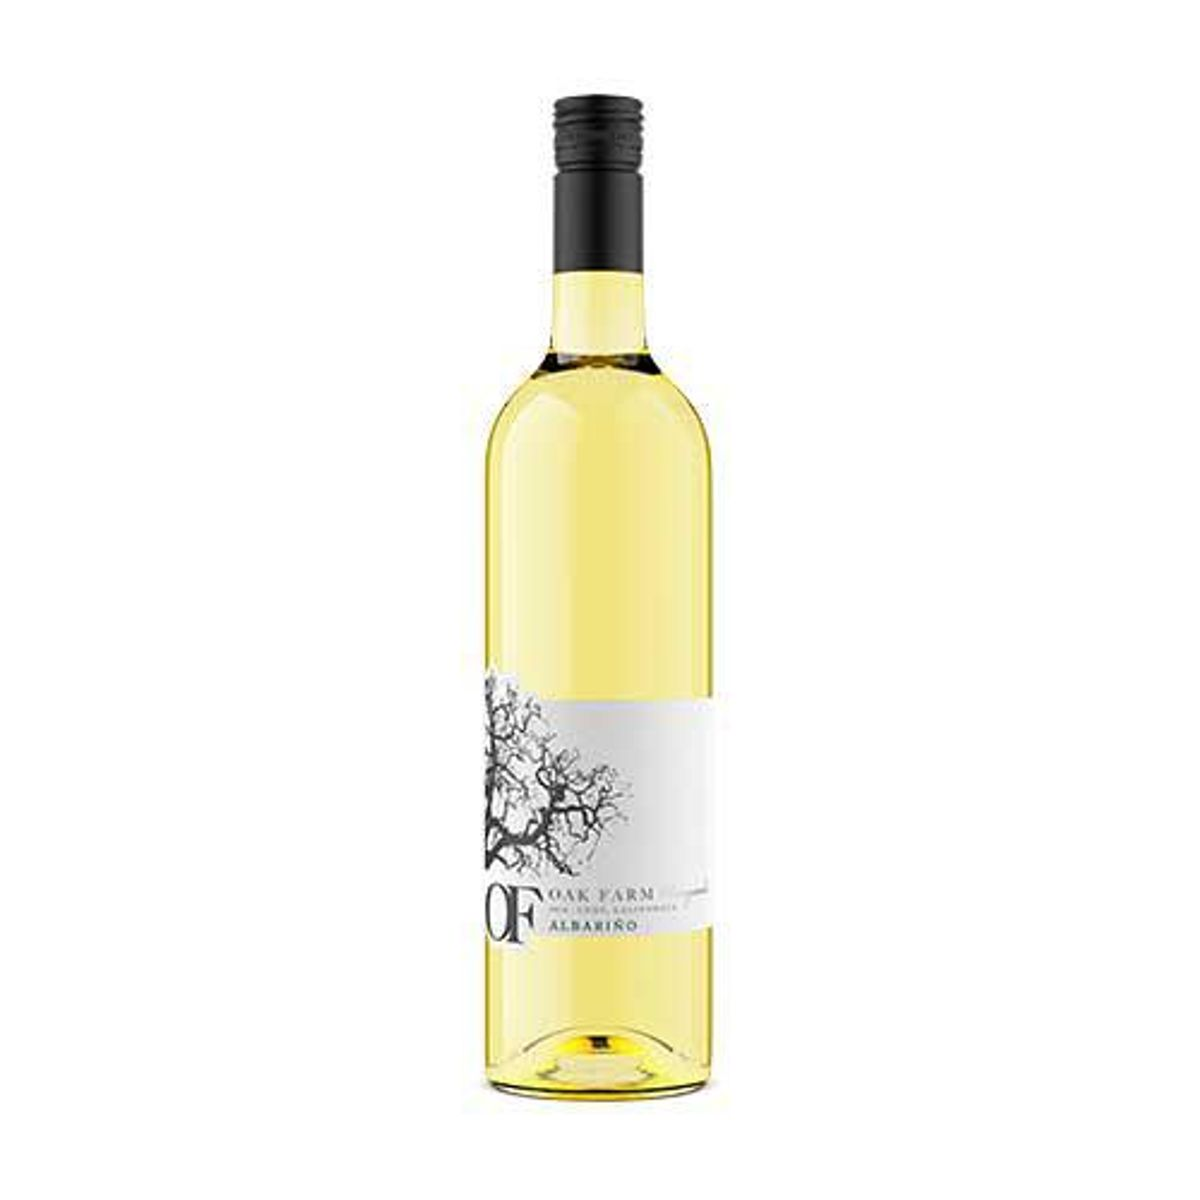 oak farm vineyards 2019 albarino